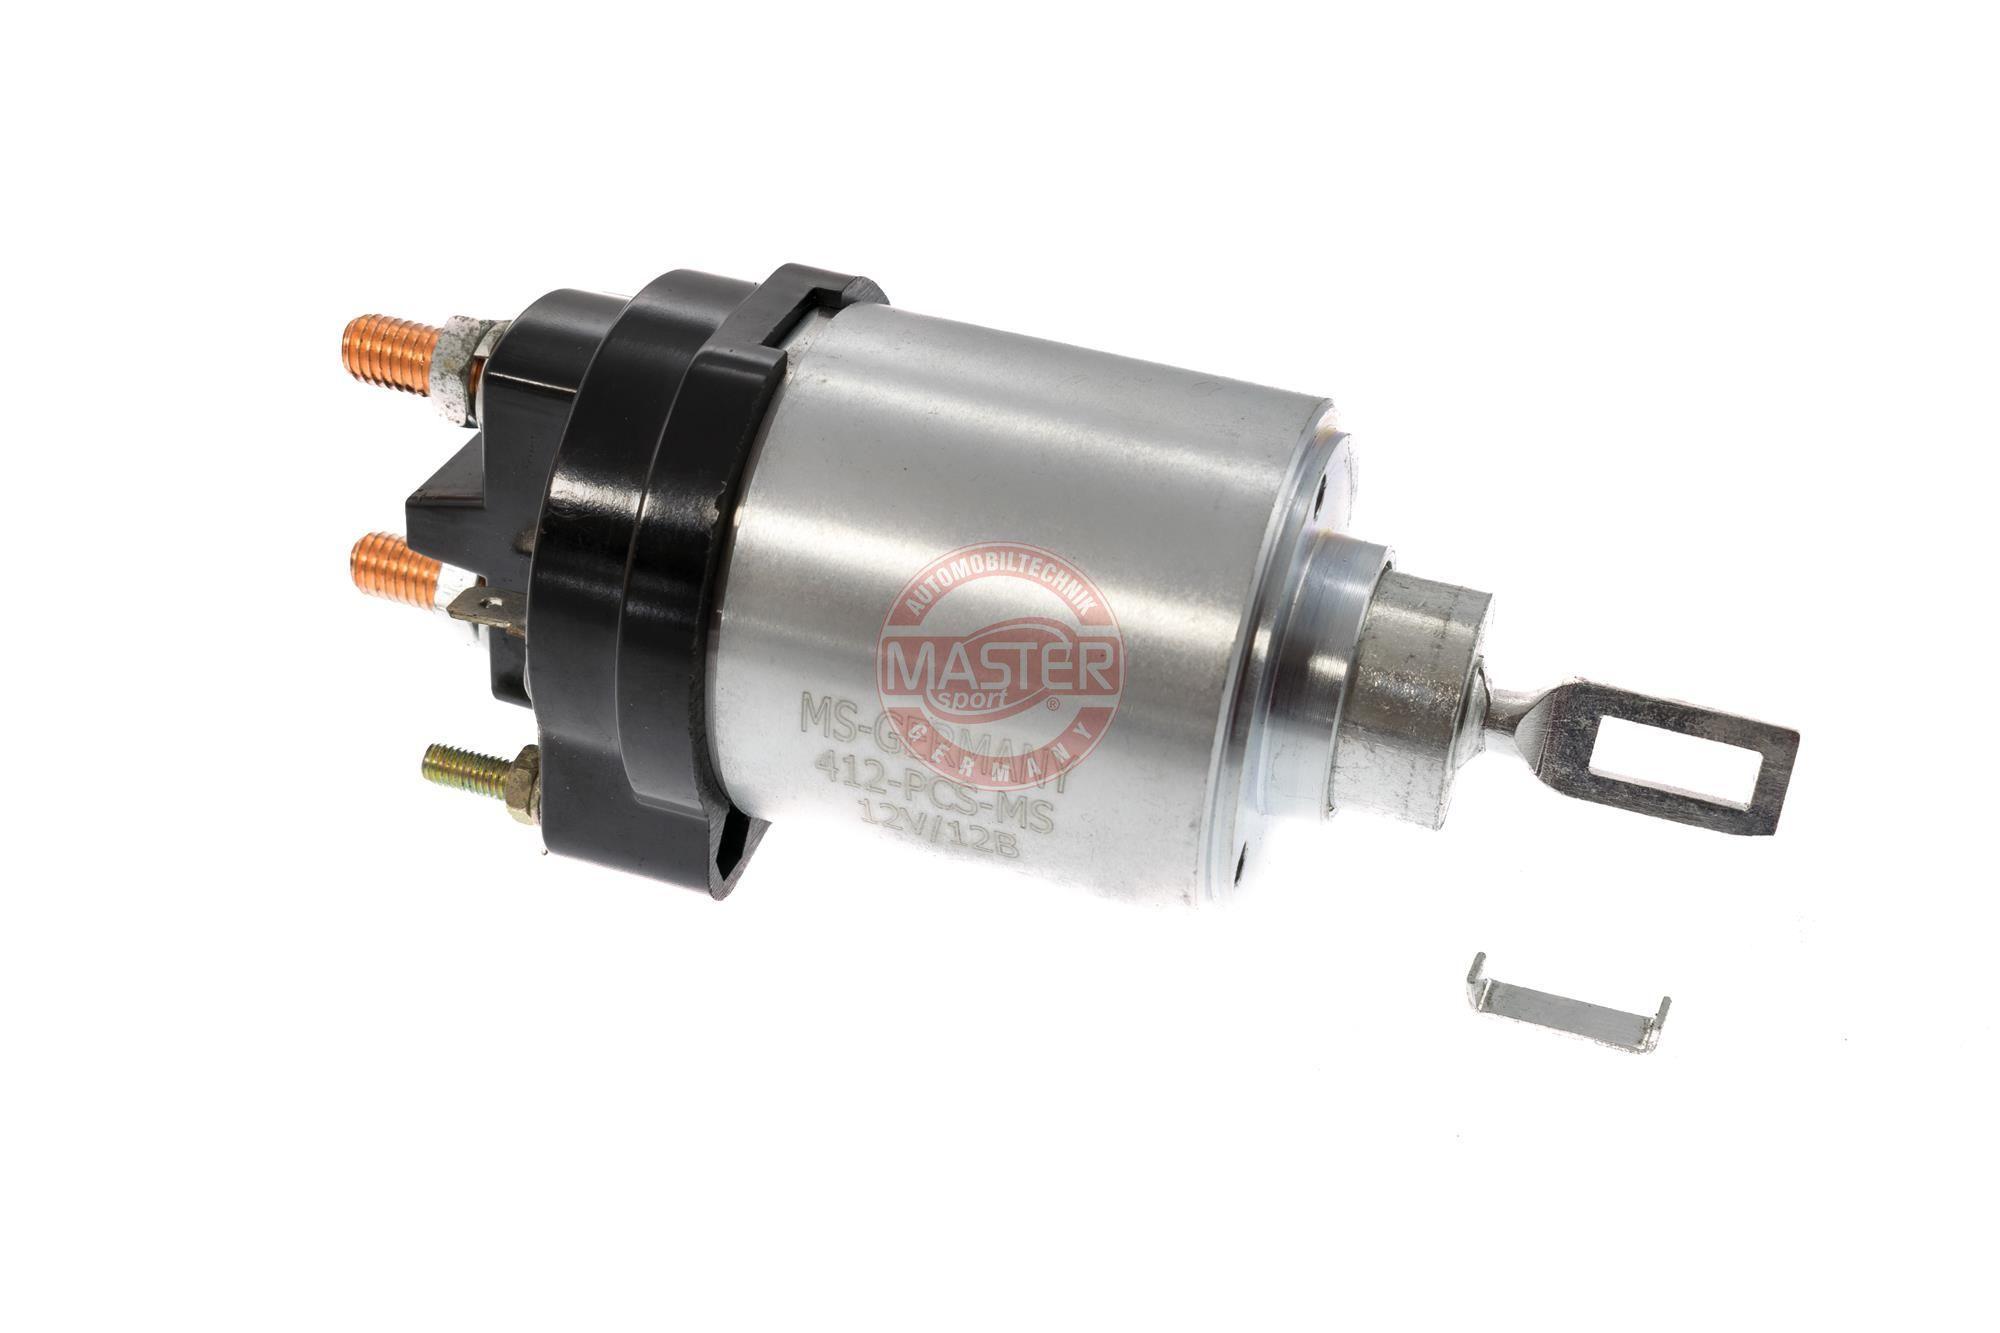 Buy Starter solenoid switch MASTER-SPORT 412-PCS-MS